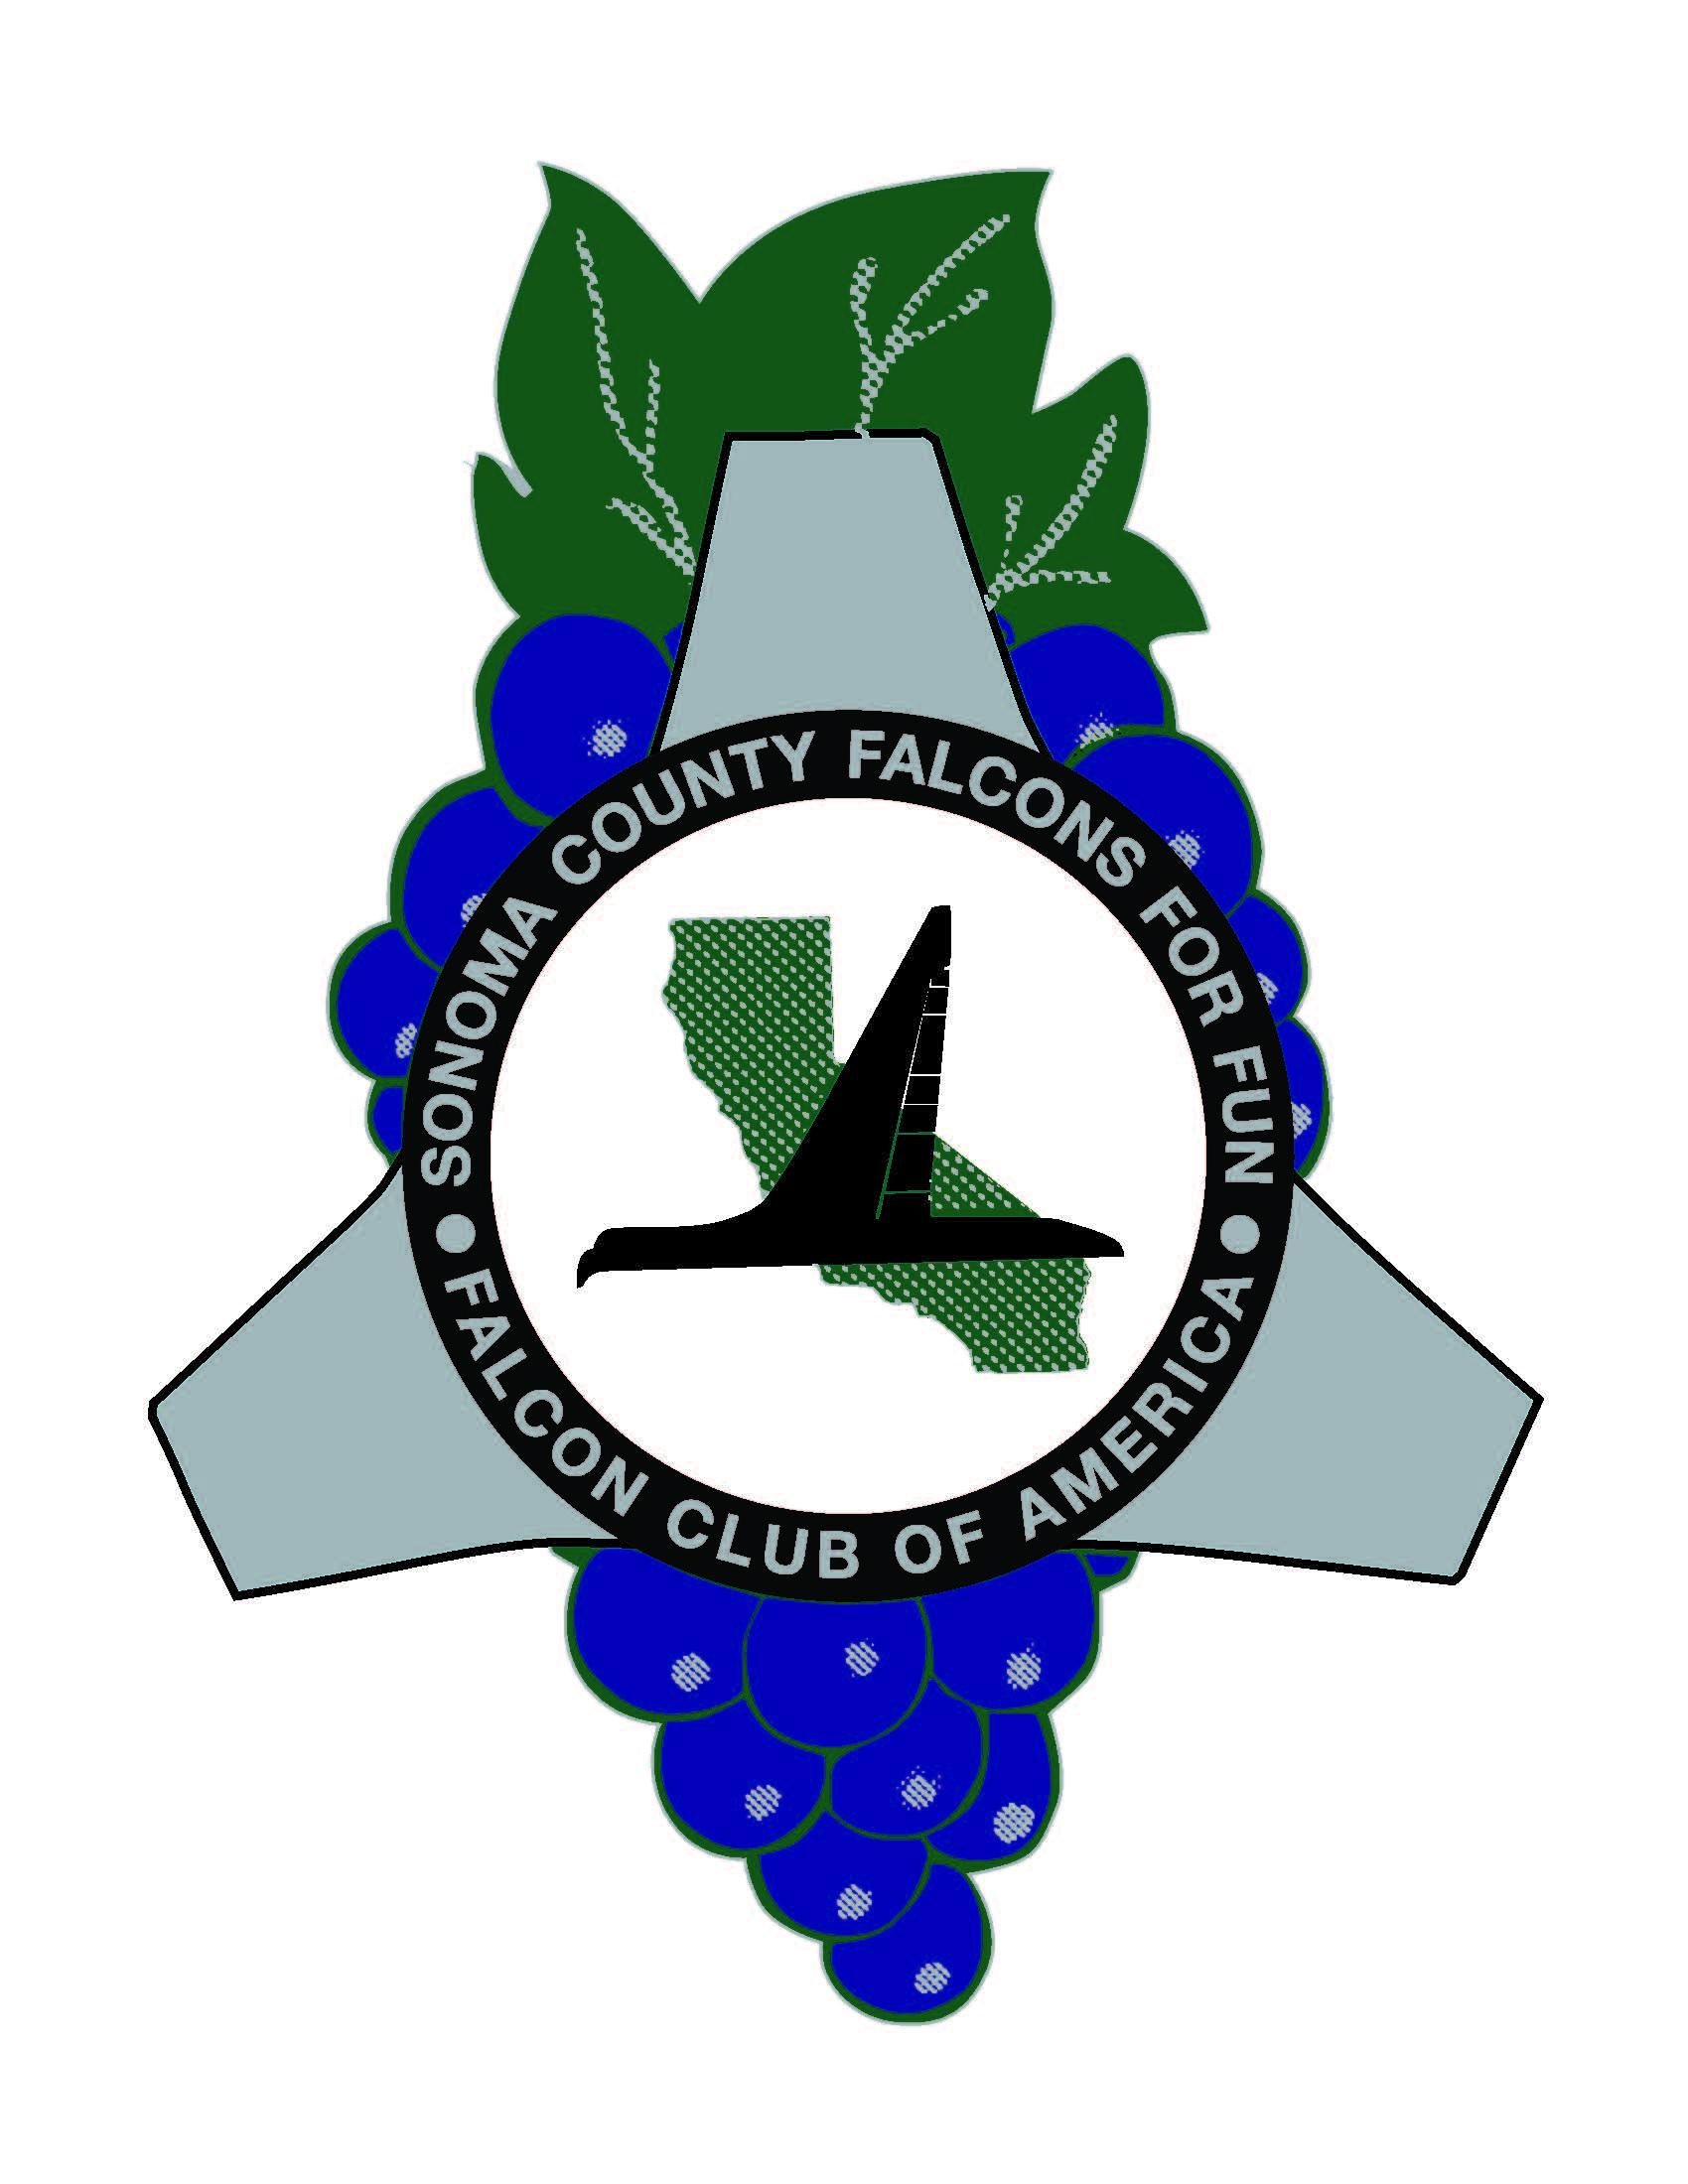 Sonoma County Falcons for Fun! CLub Logo